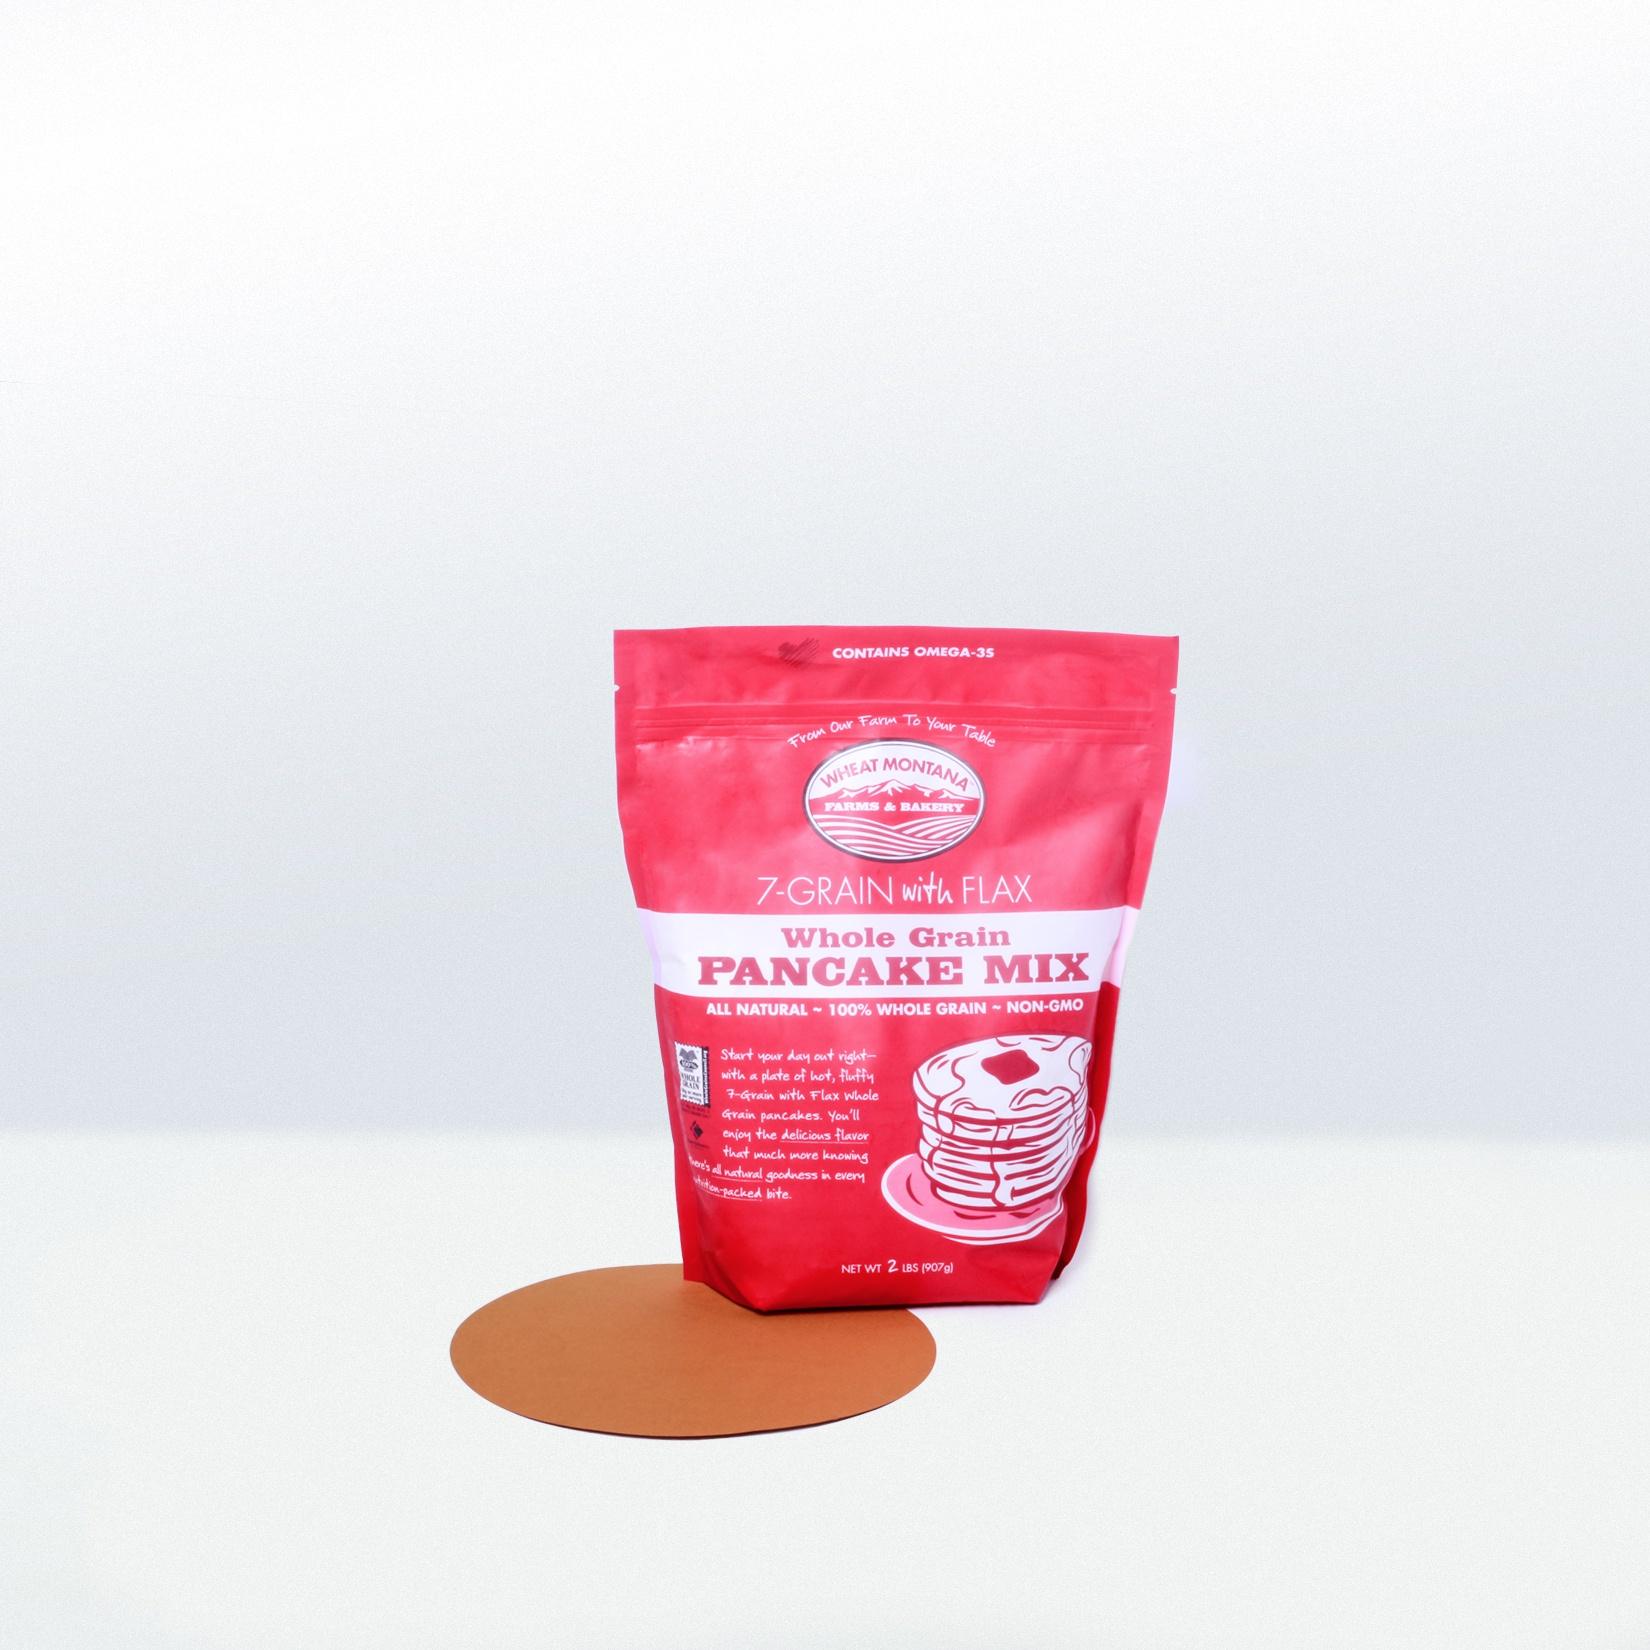 Wheat Montana-7 Grain with FlaxWhole Grain Pancake Mix